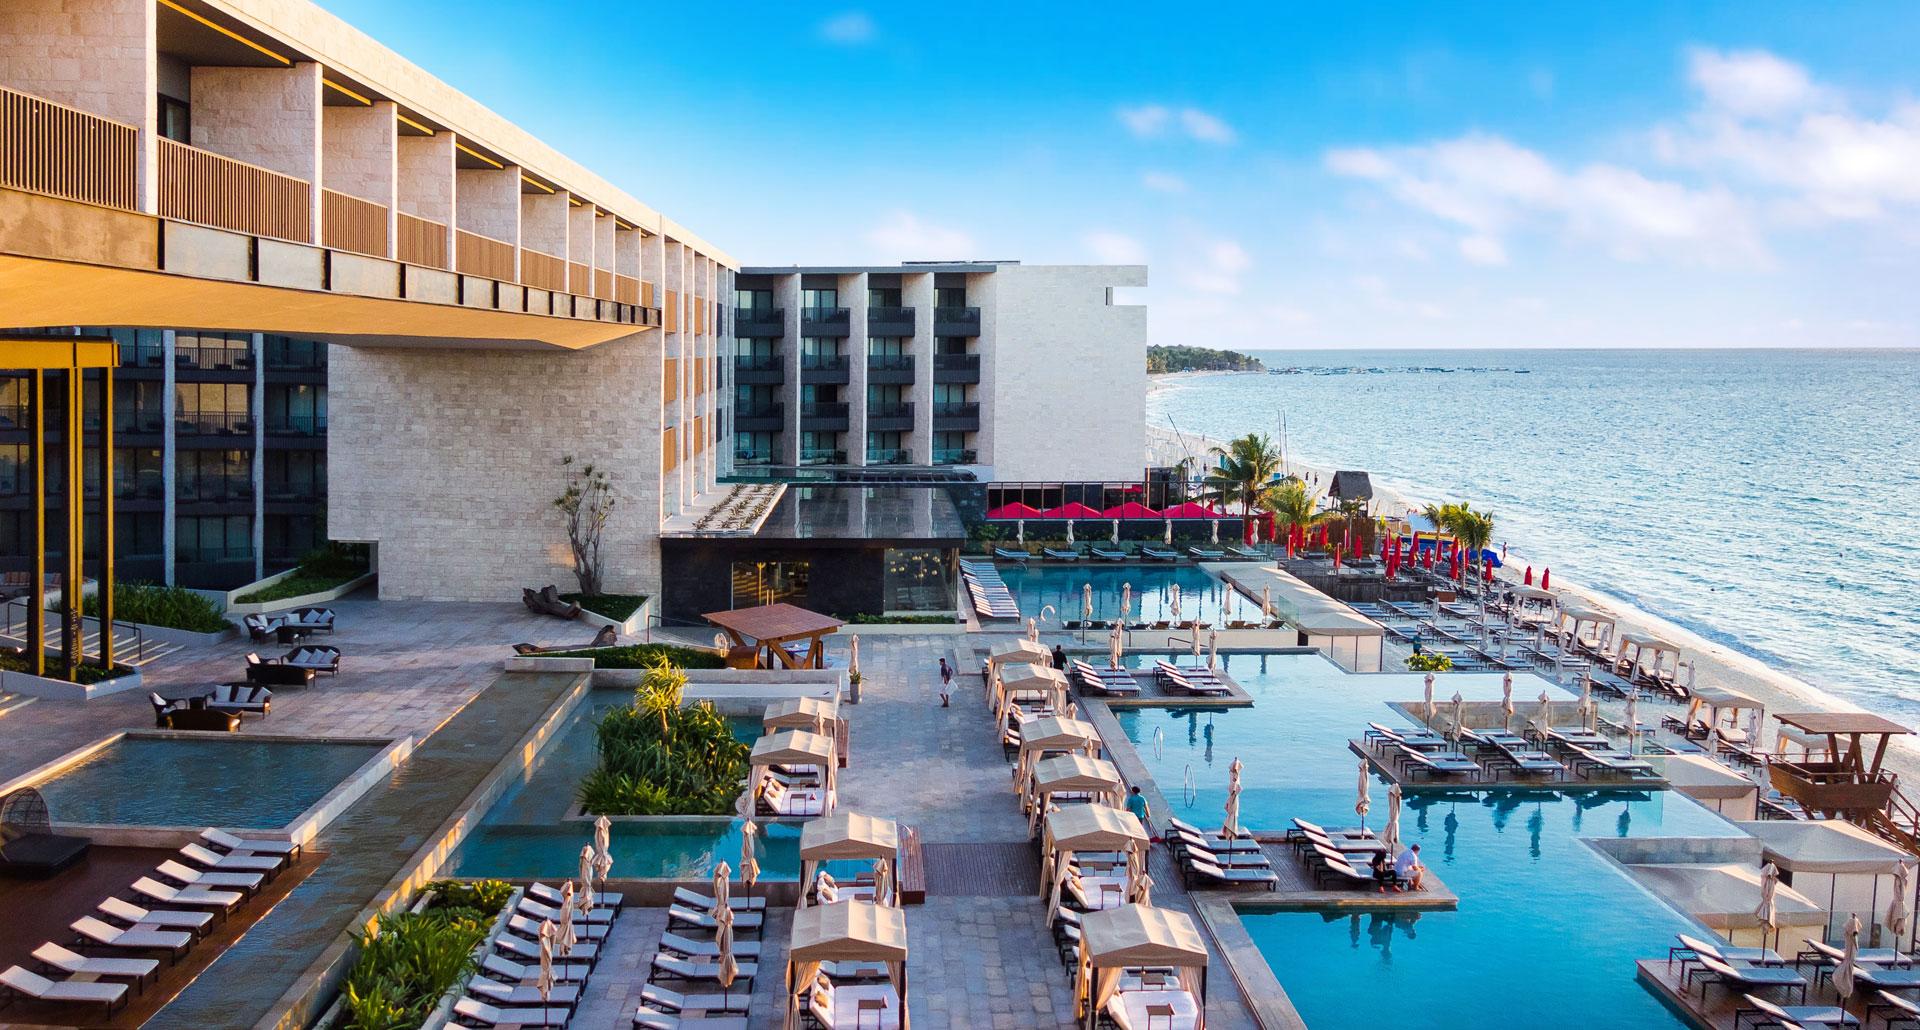 Grand Hyatt Playa del Carmen - boutique hotel in Playa del Carmen